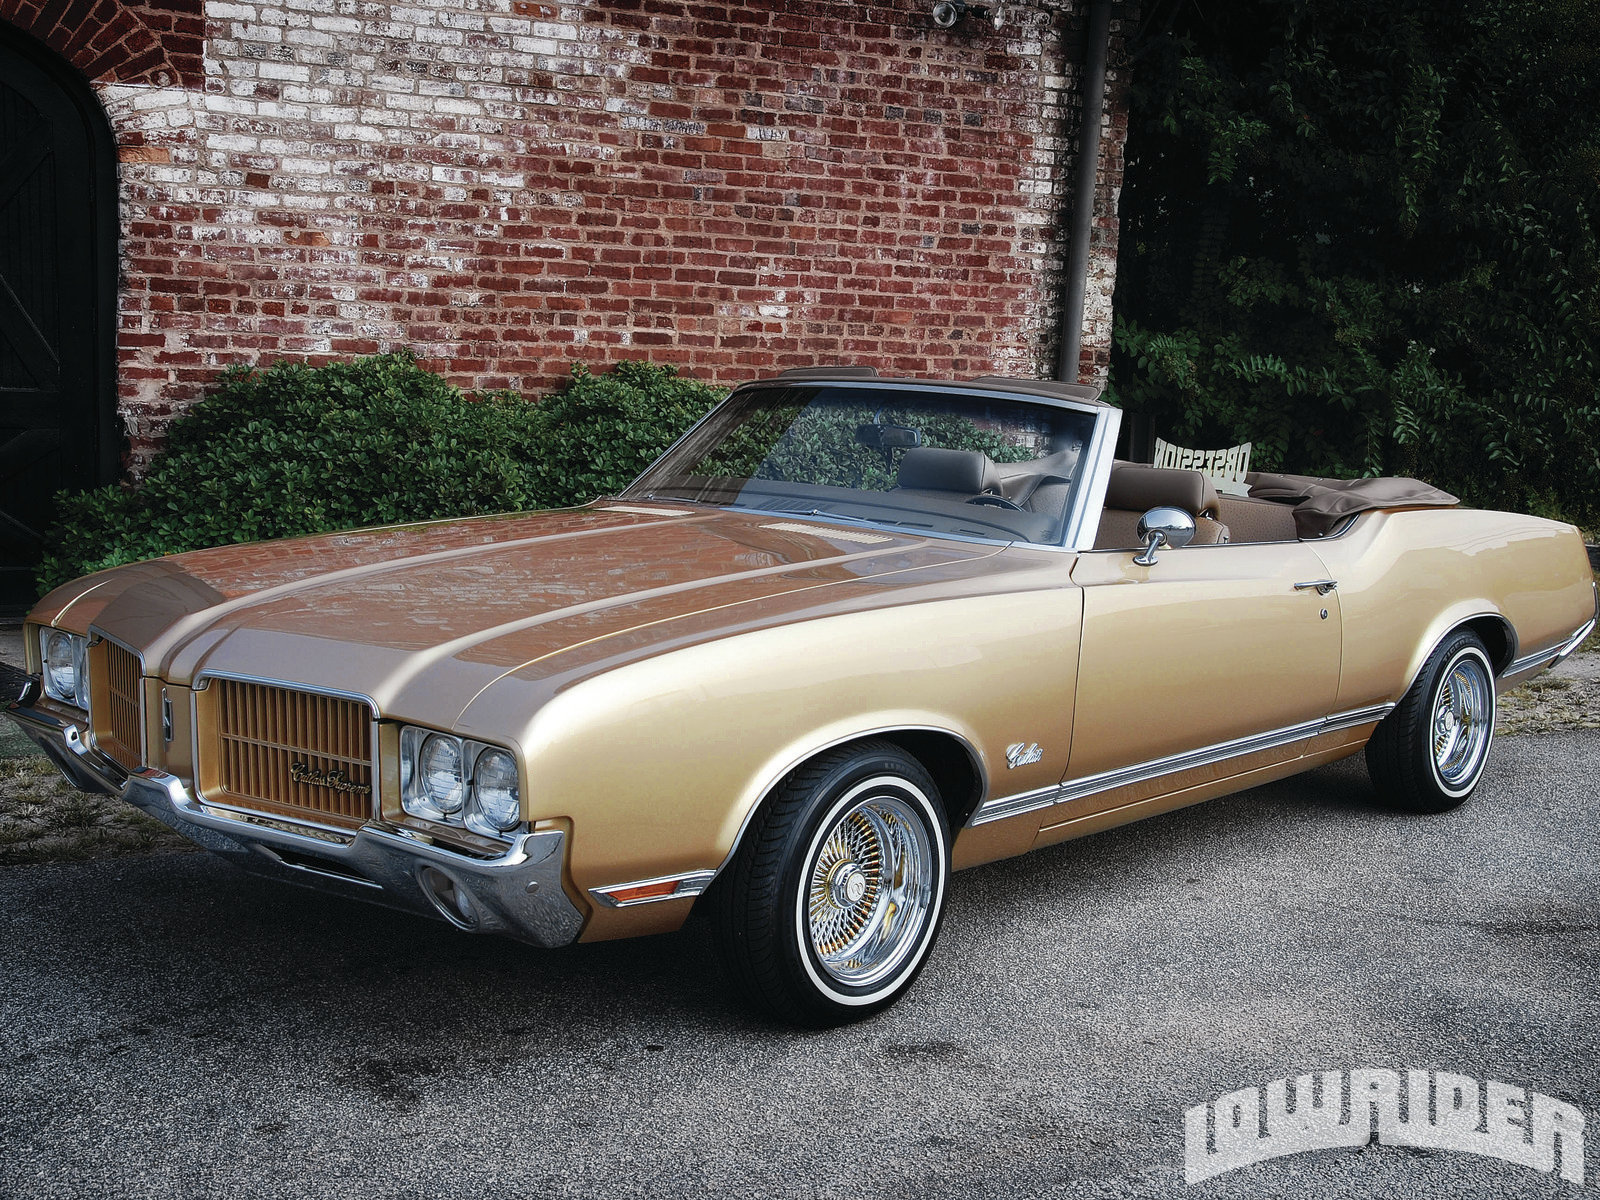 1971 Oldsmobile Cutlass - Lowrider Magazine